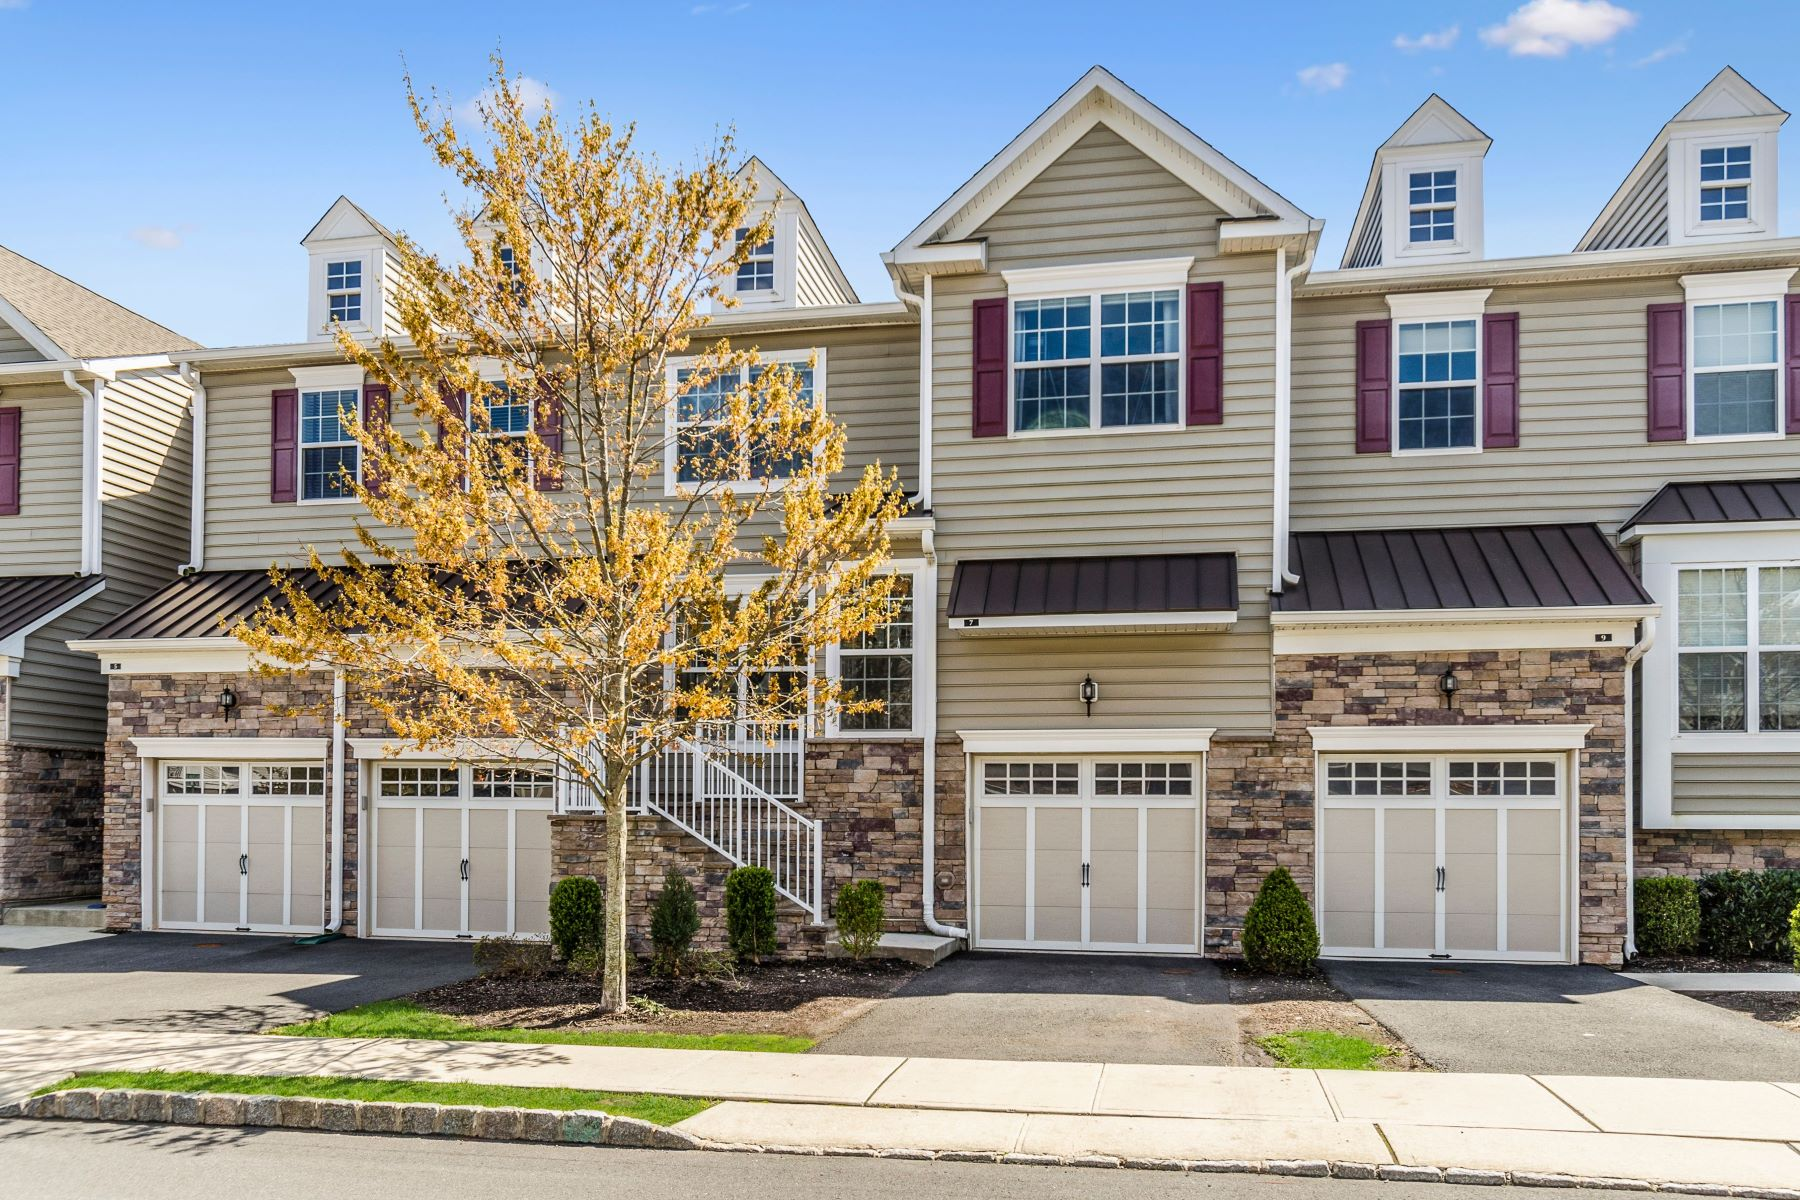 townhouses για την Πώληση στο A Designer Feel To This Montgomery Ridge Home 7 Braeburn Drive, Skillman, Νιου Τζερσεϋ 08558 Ηνωμένες Πολιτείες